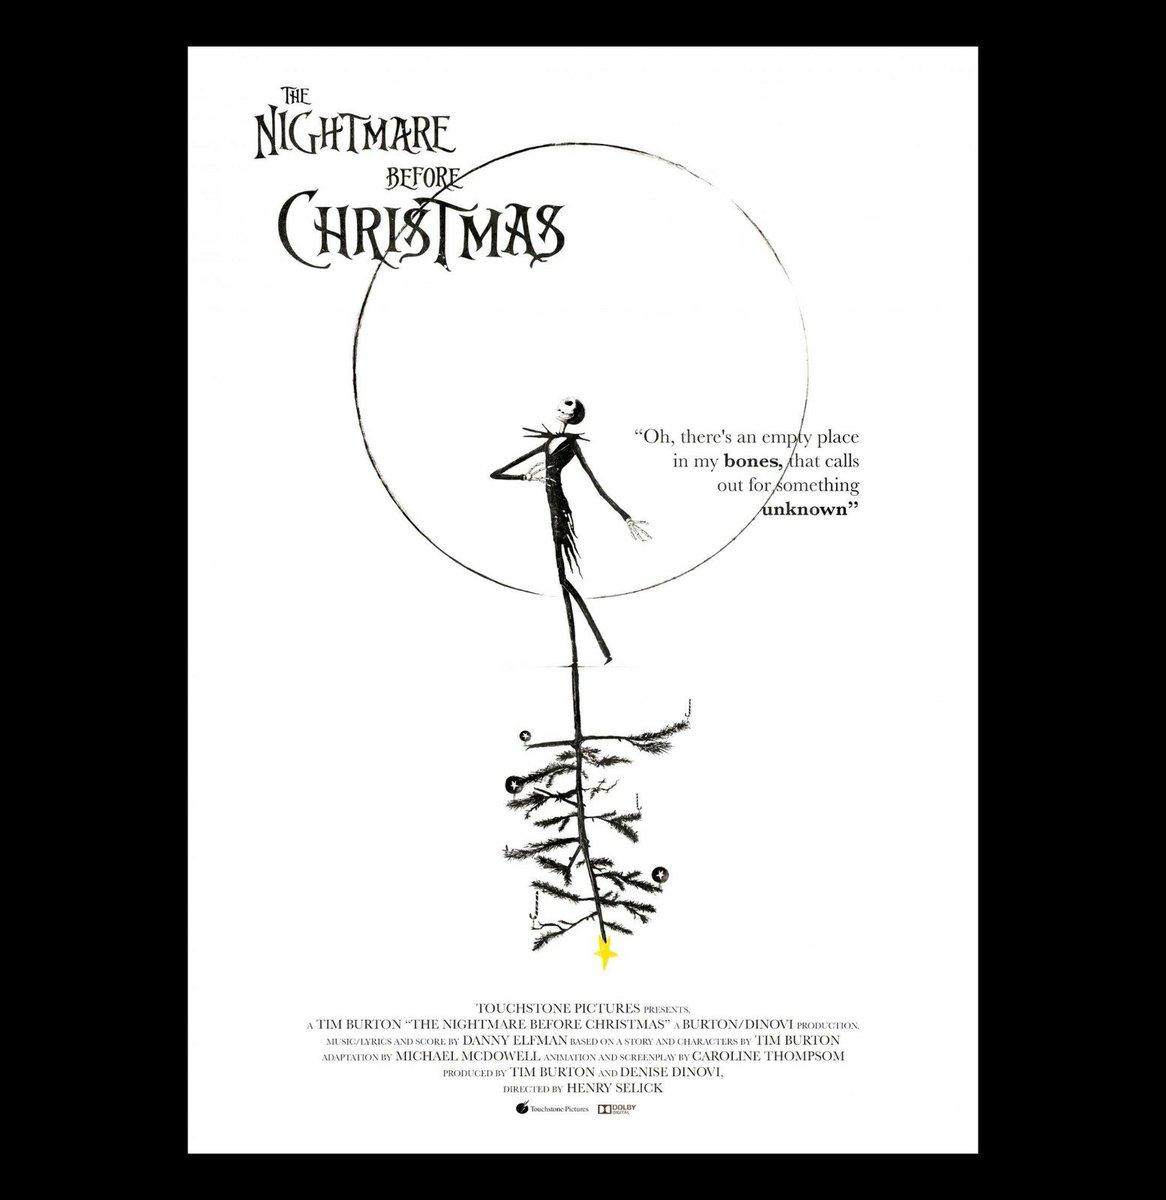 My alt. poster for The Nightmare Before Christmas #timburton #thenightmarebeforechristmas #movieposter #posterdesign #alternativemovieposterpic.twitter.com/UCdOveJ8Mp